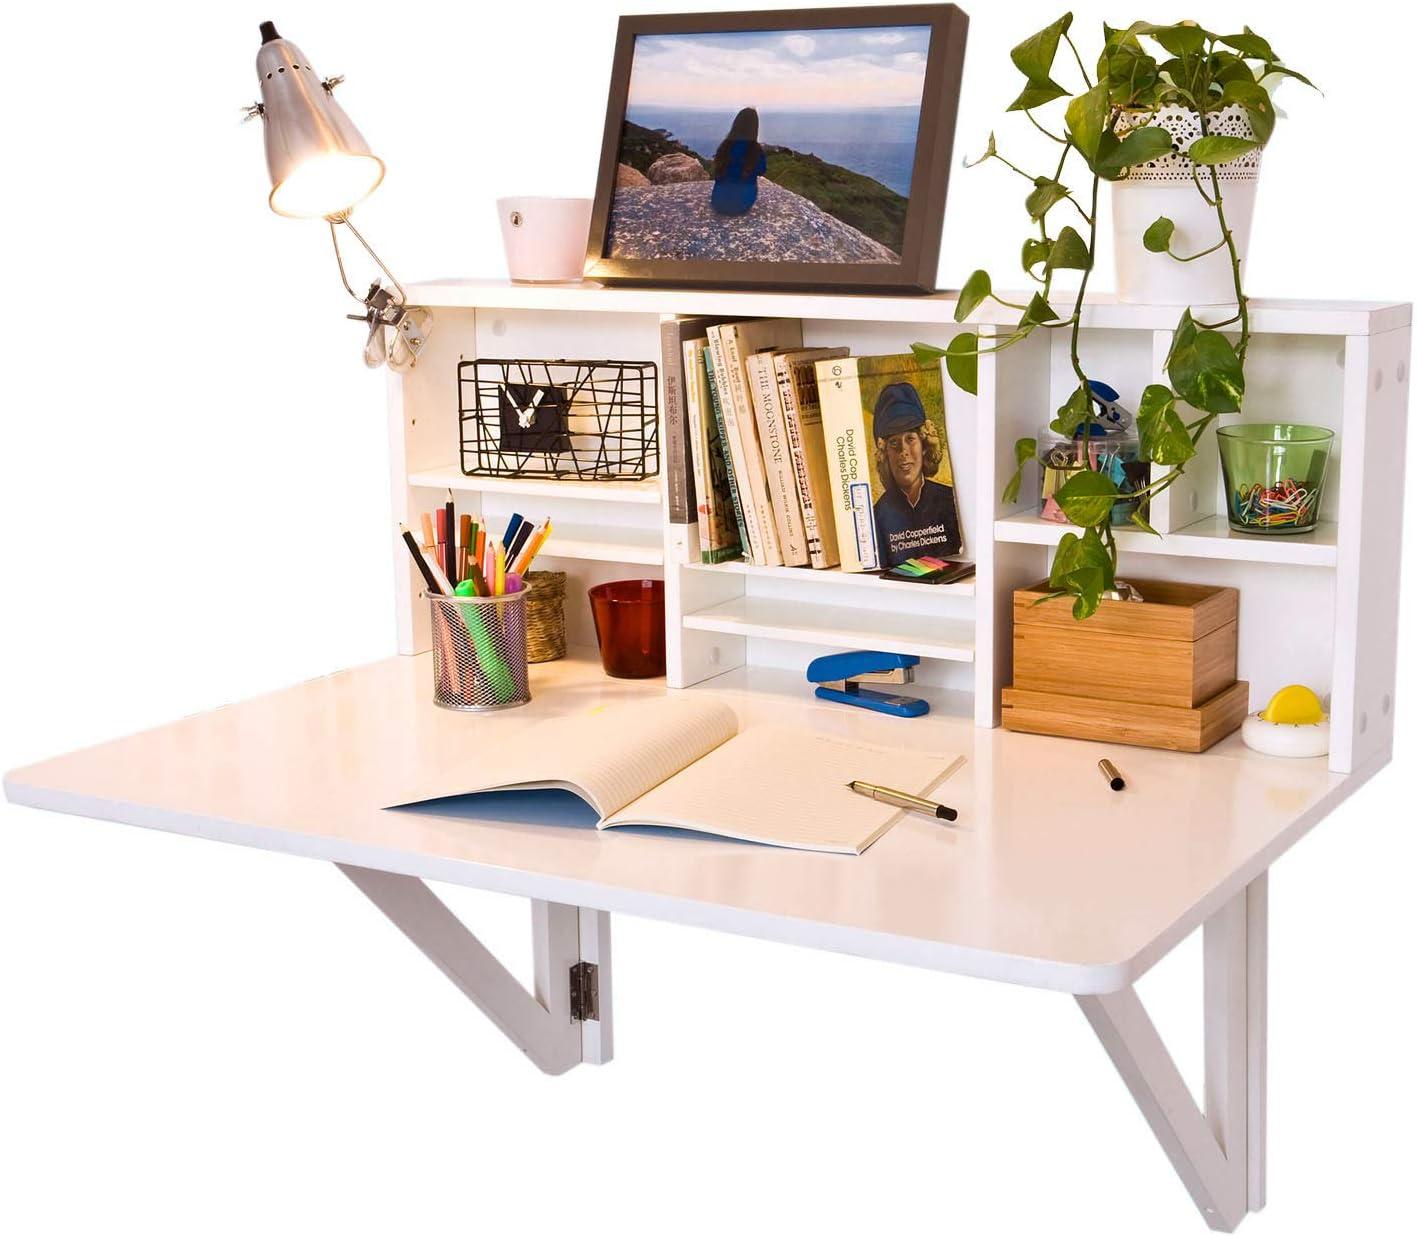 SoBuy Mesa plegable de pared con estante integrado, B90 x H36 x ...